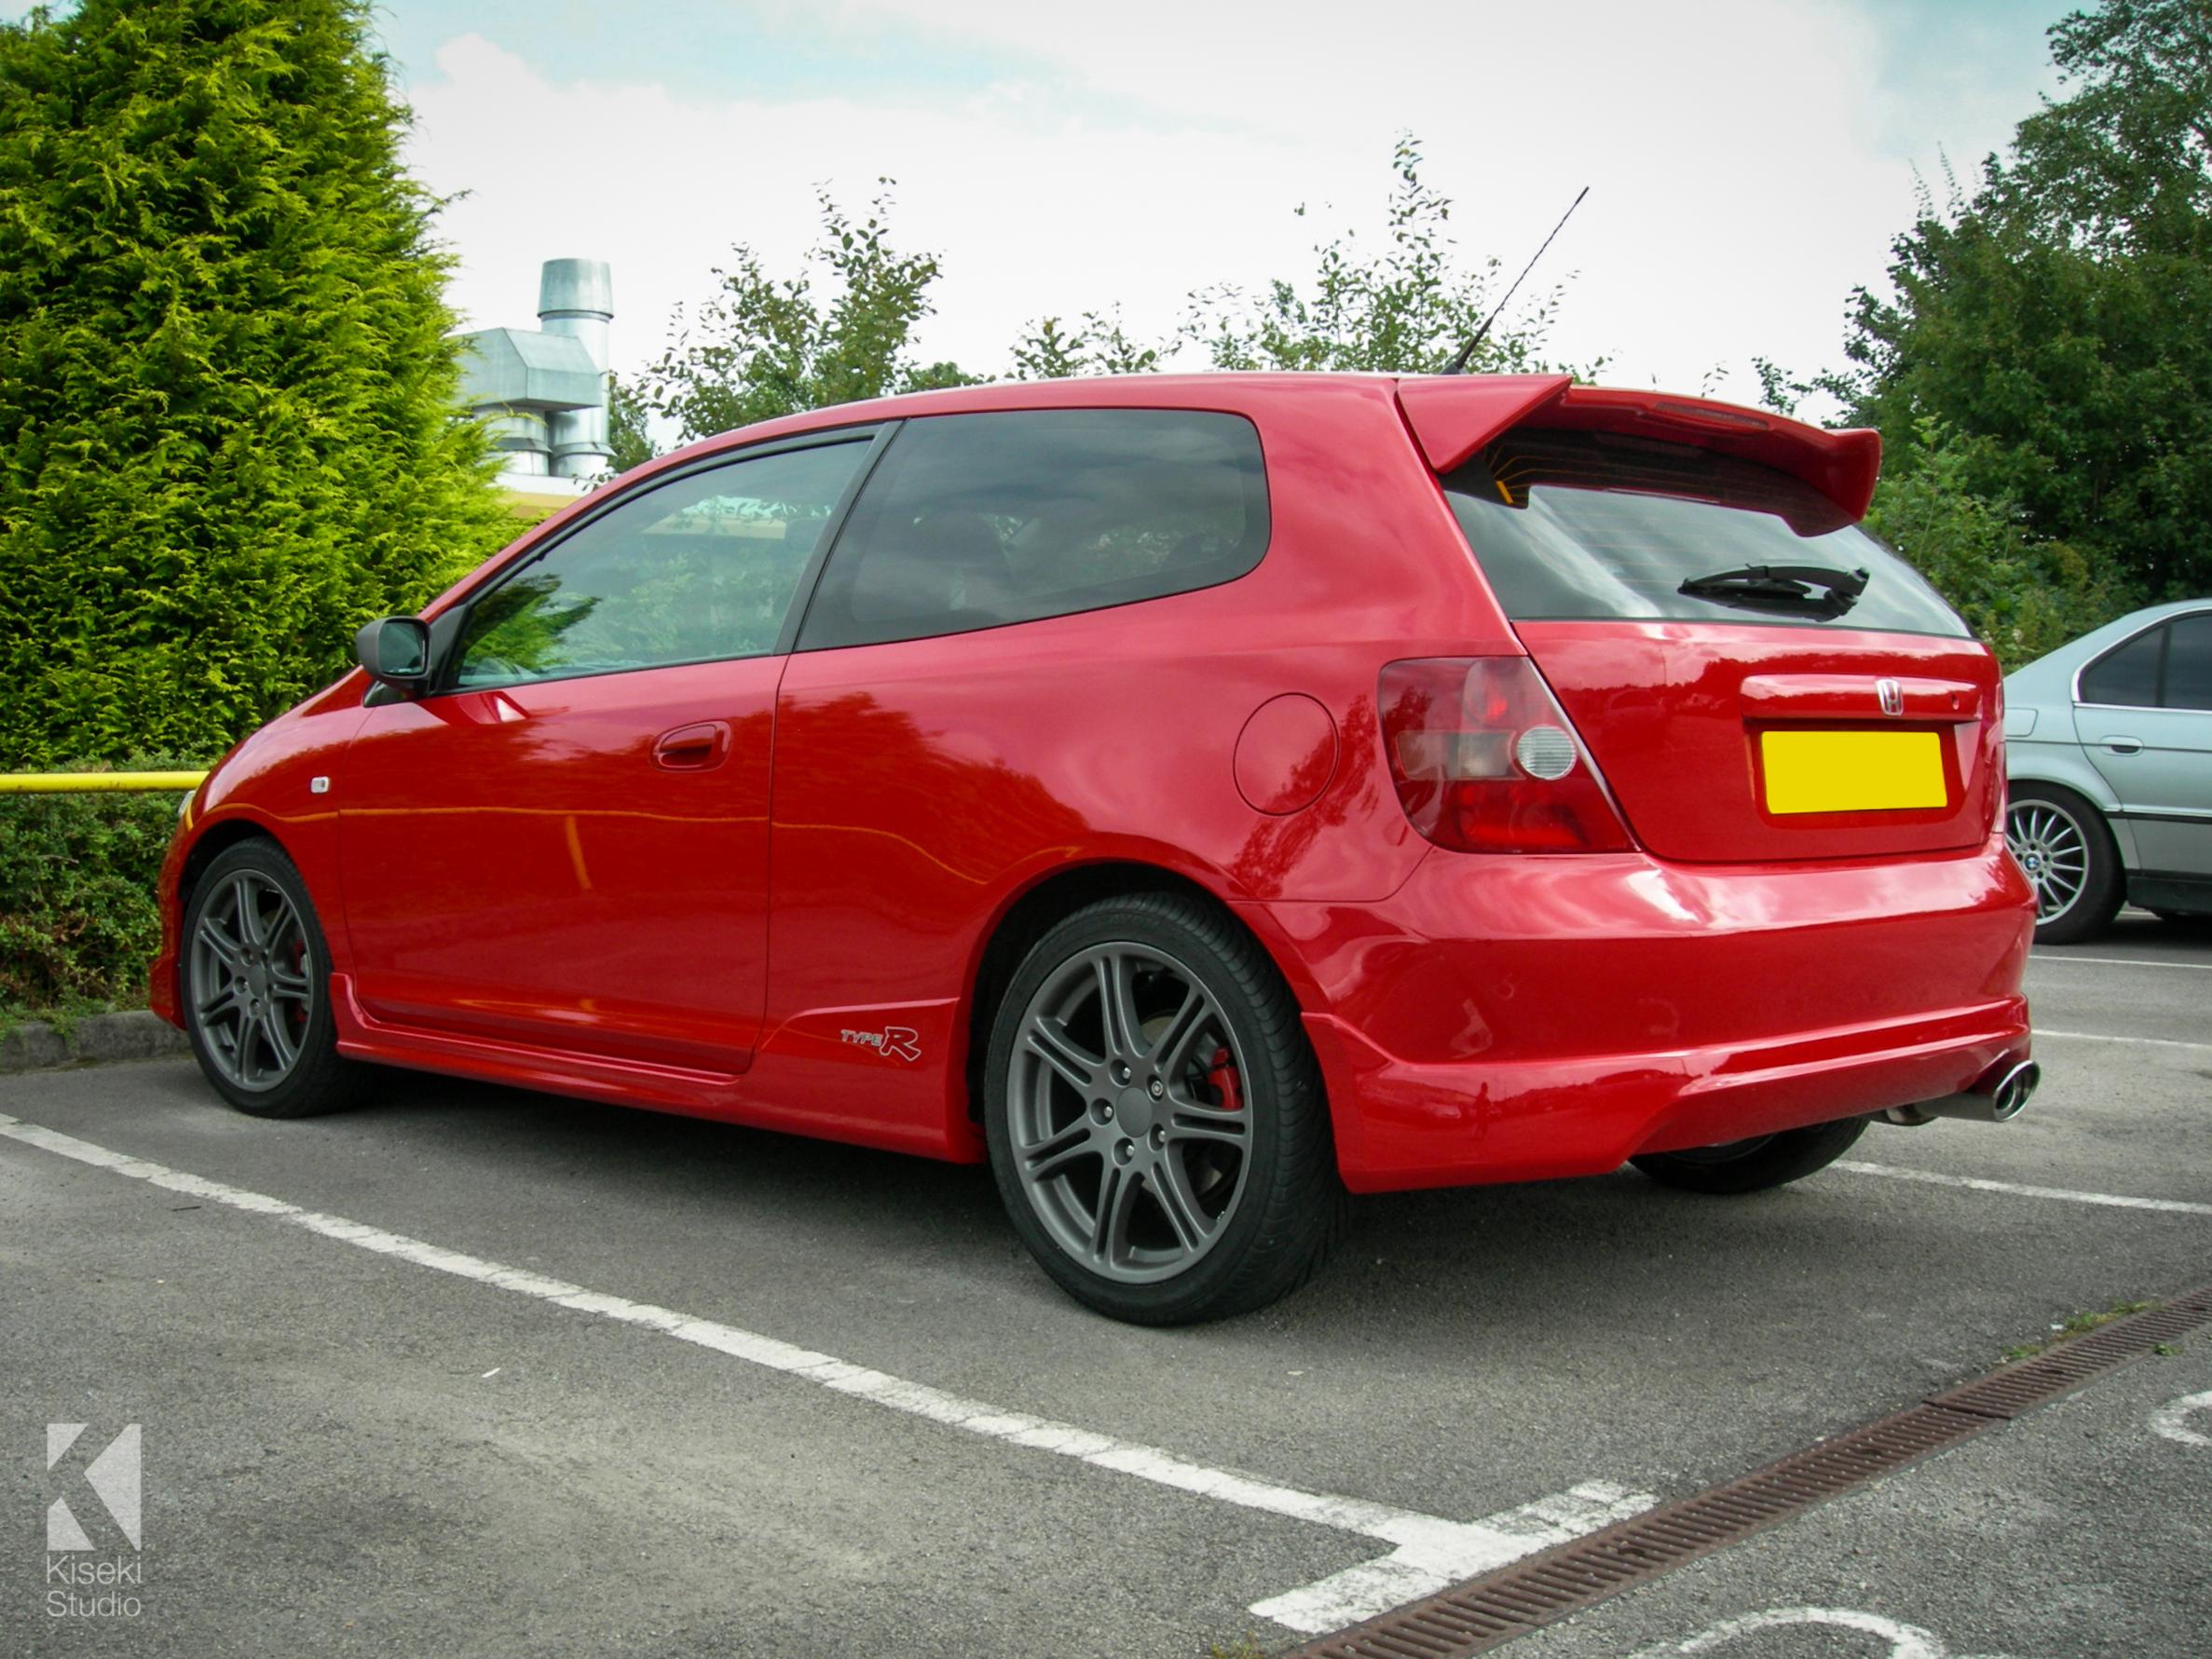 Honda Civic Type-R EP3 Red - KAG Automotive Care